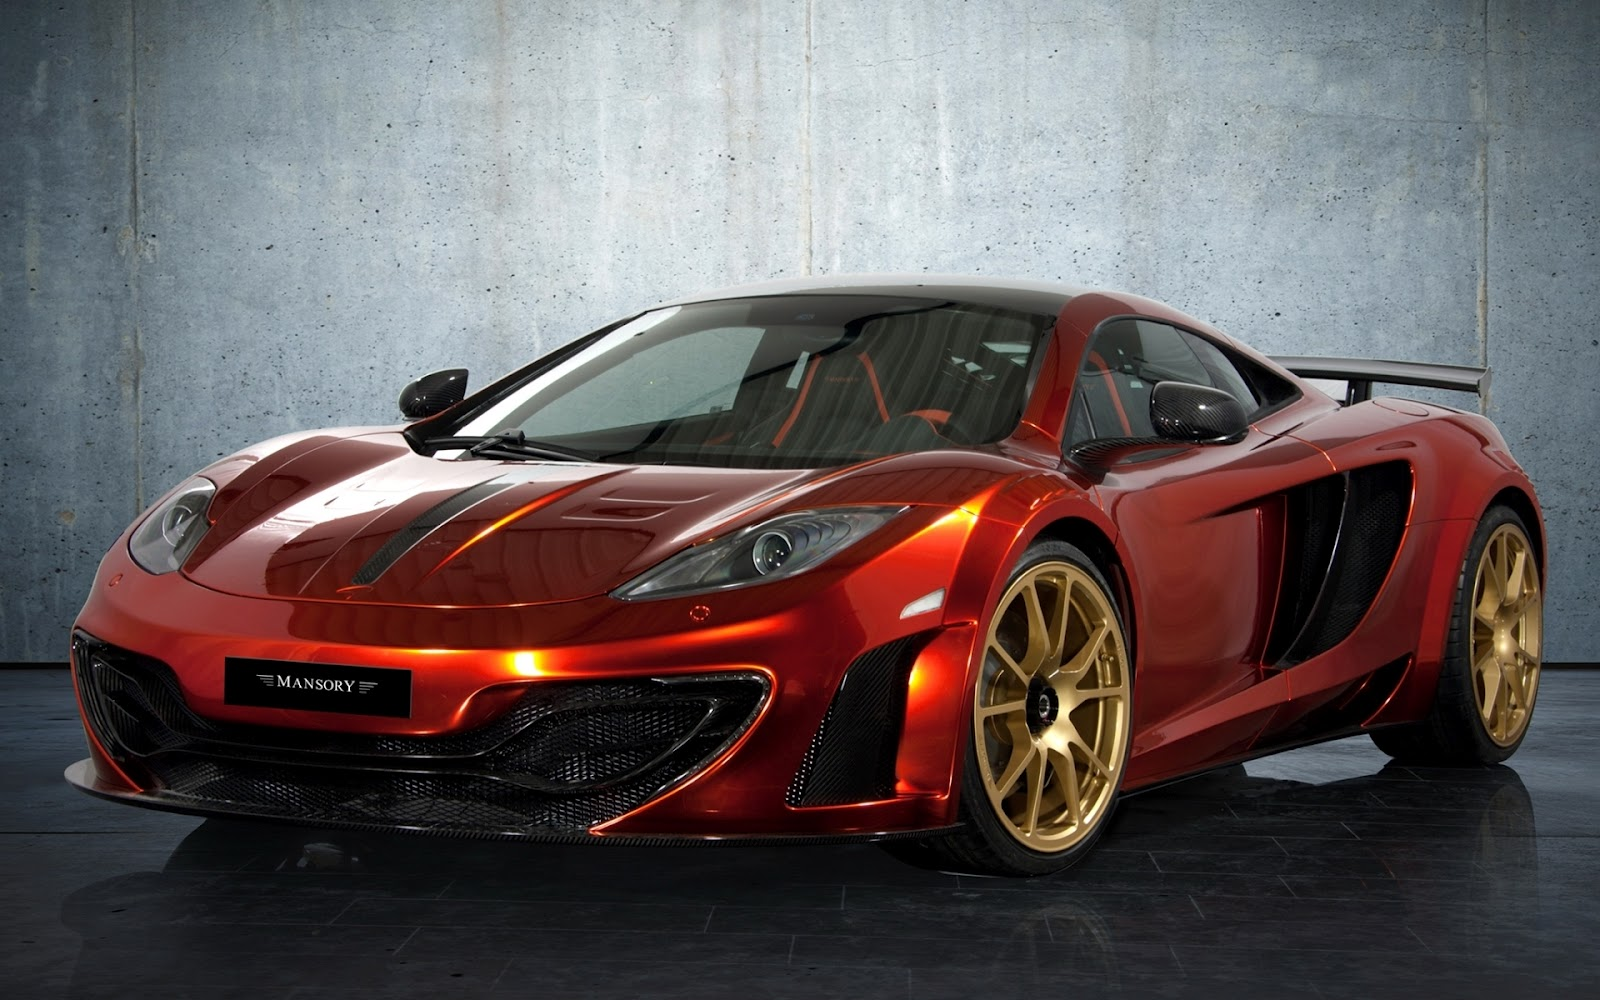 http://3.bp.blogspot.com/-H5hF-AZxz4k/T6MzoQ4fajI/AAAAAAAAbug/3ewIaj8cU-I/s1600/Mansory-McLaren-MP4-12C.jpg